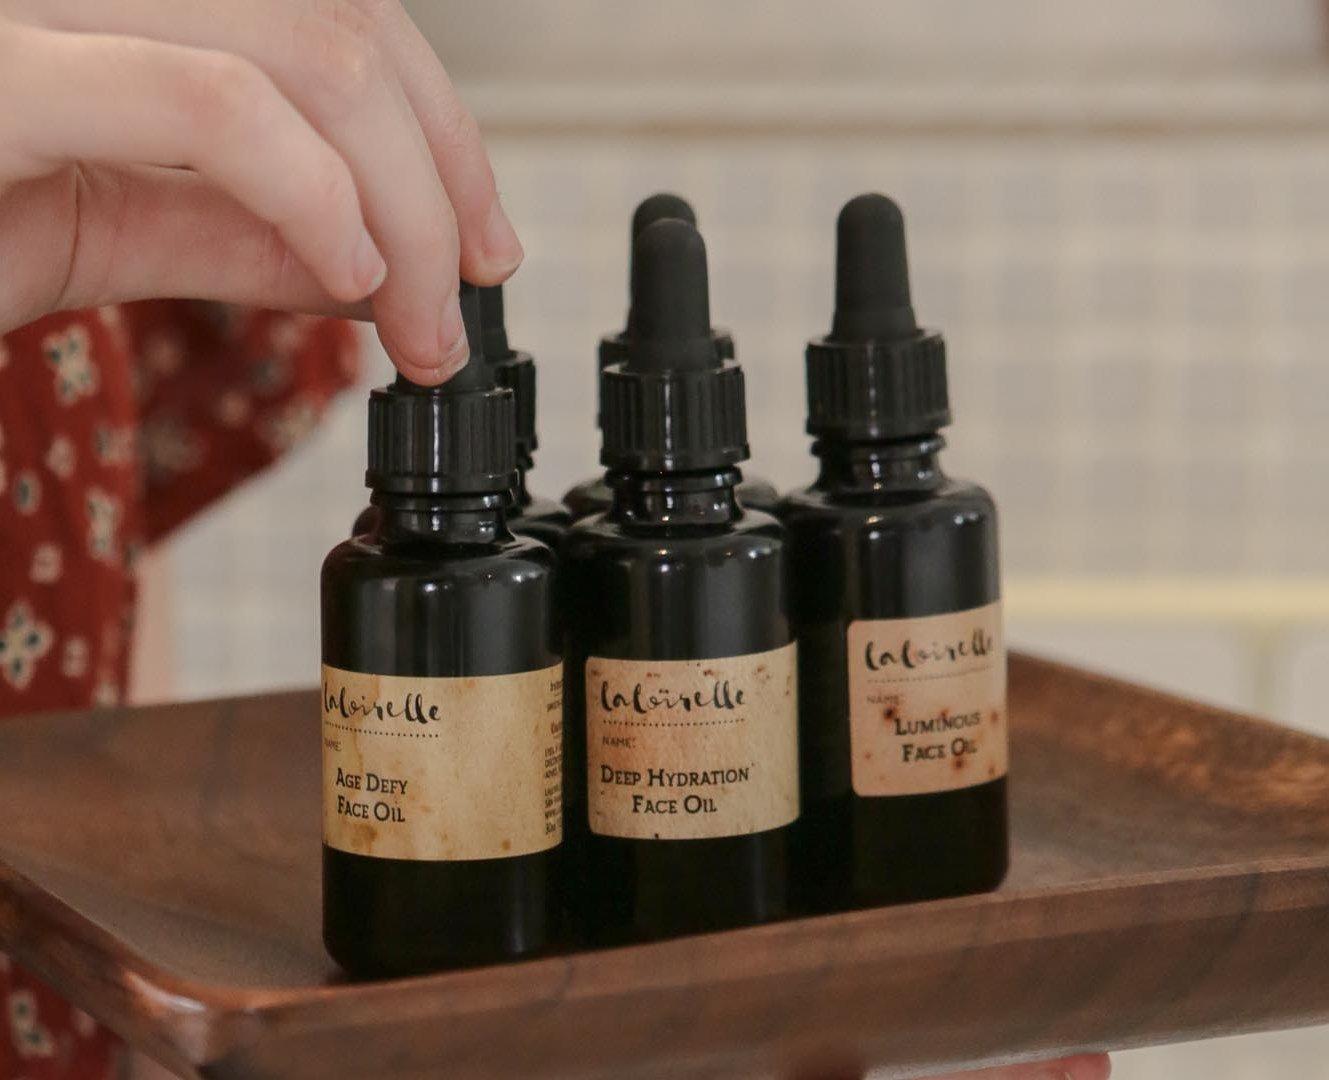 Laloirelle face oil natural organic skincare